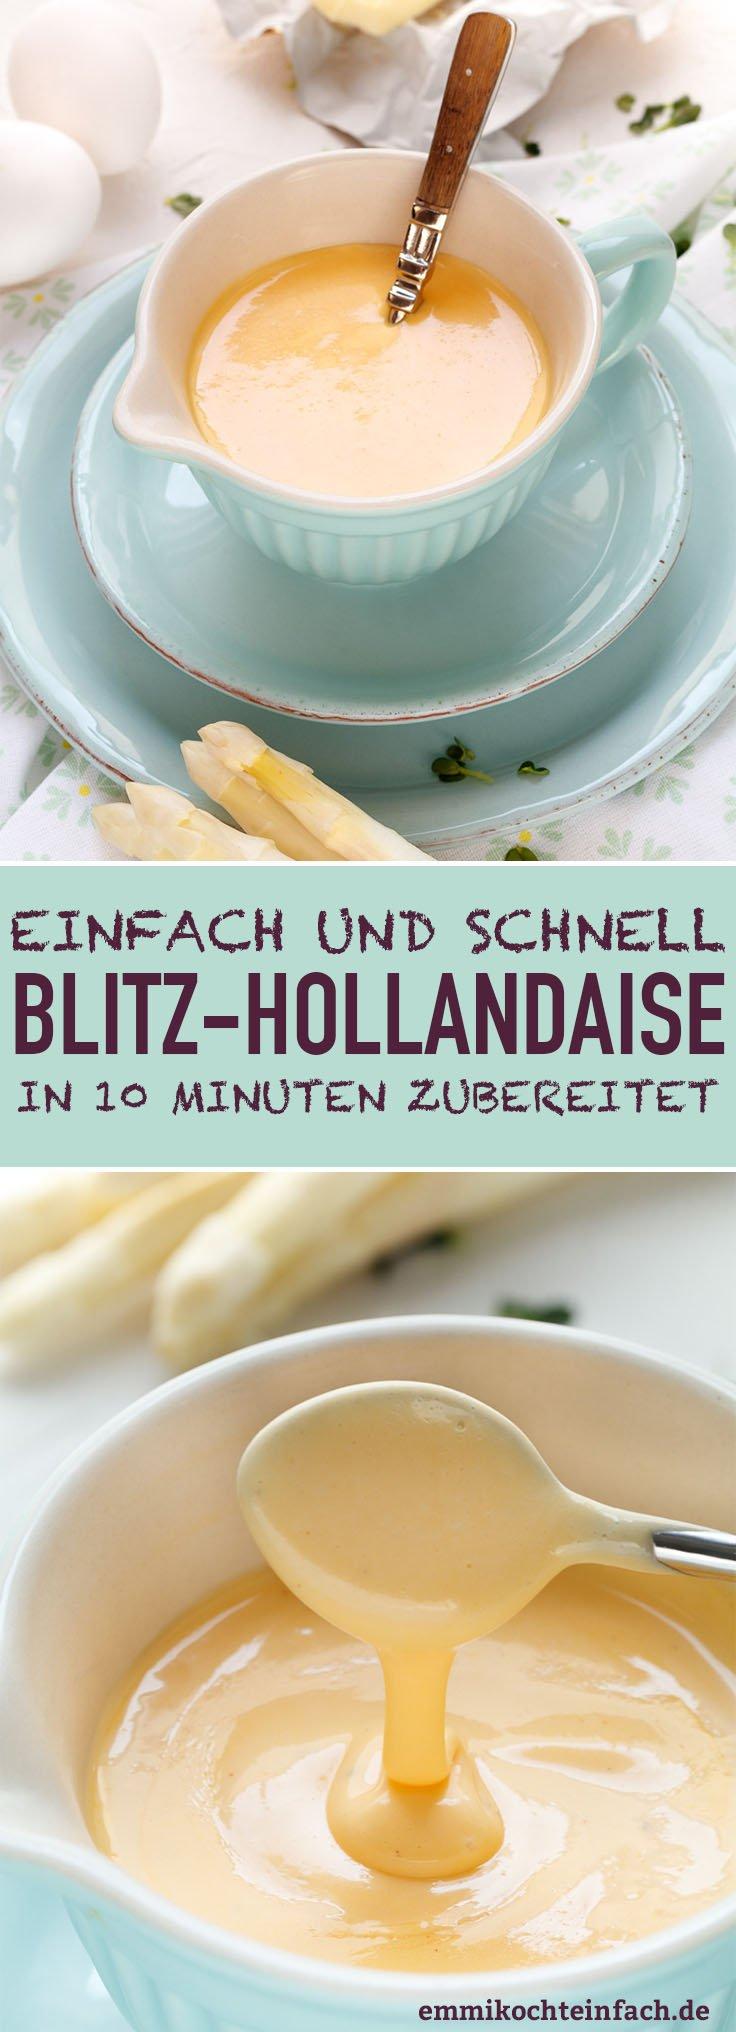 Blitz-Hollandaise - www.emmikochteinfach.de